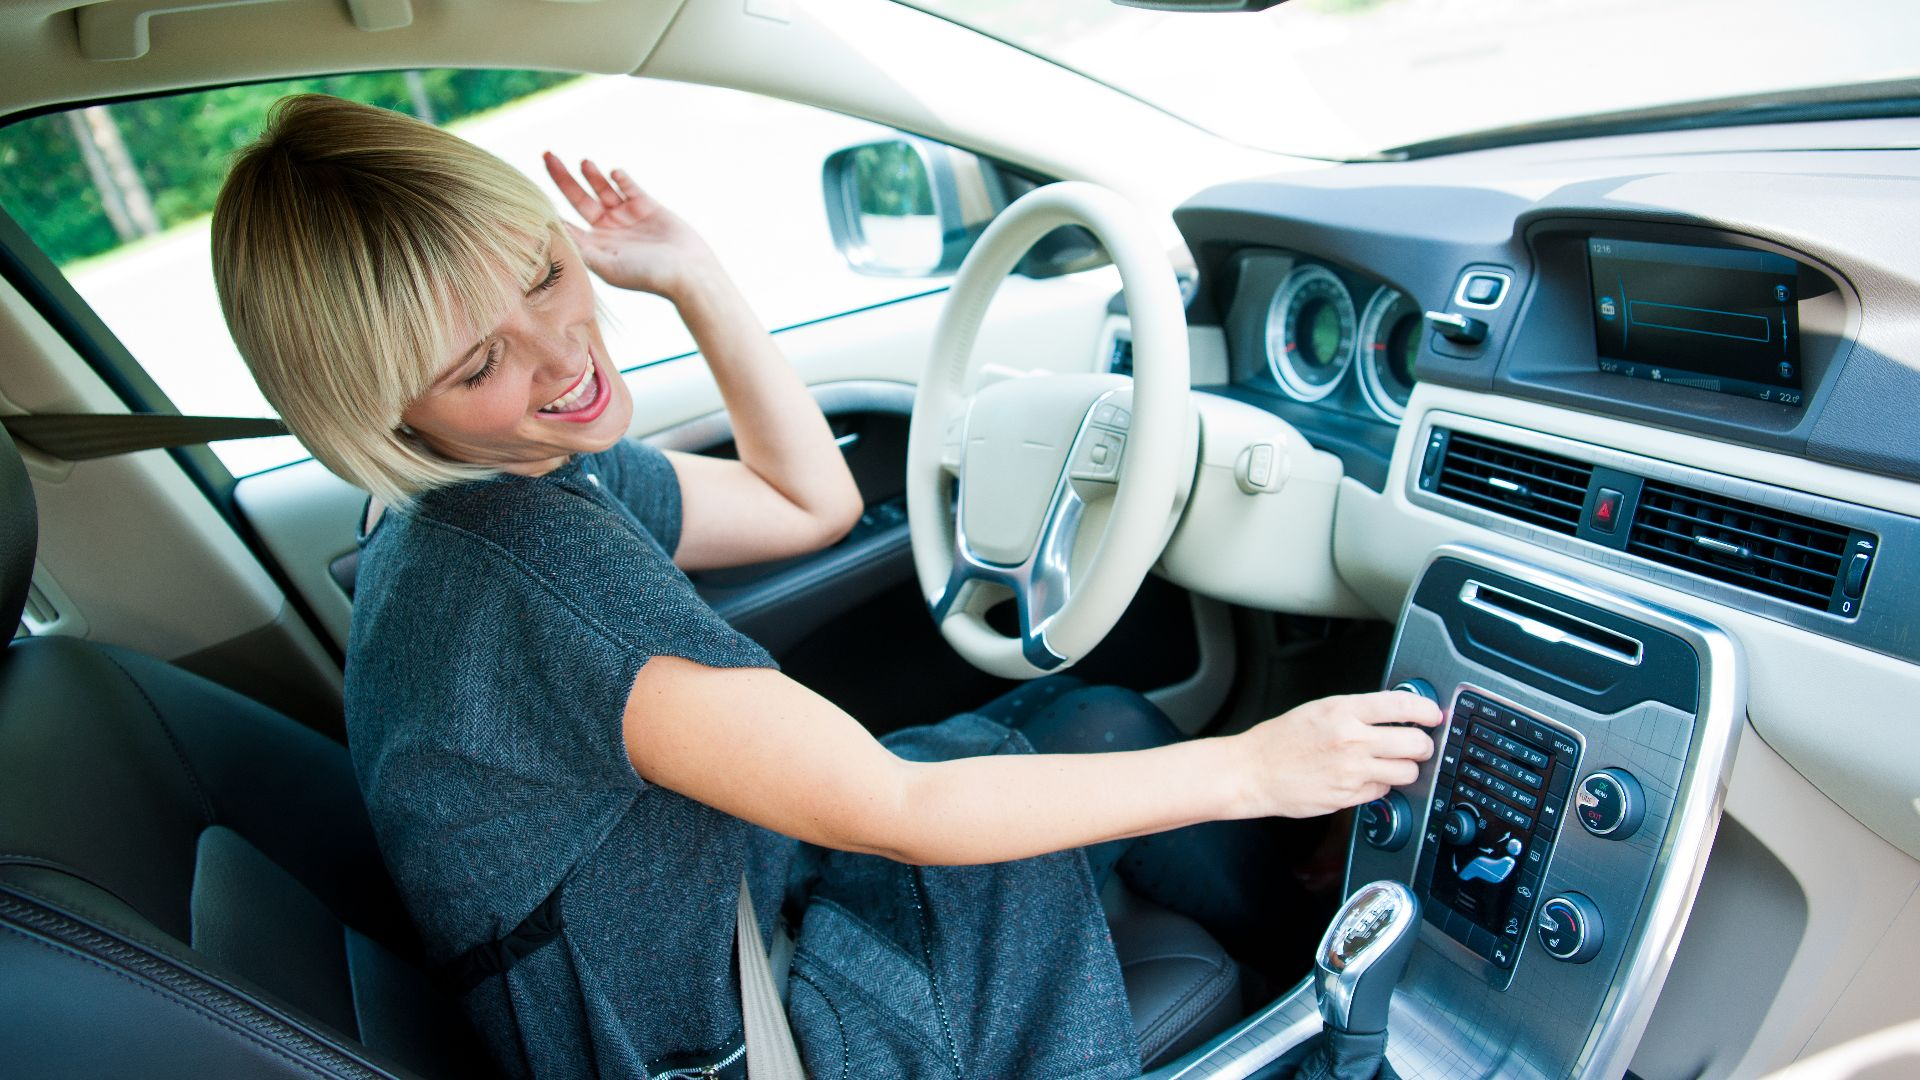 Feel-good happy driving songs